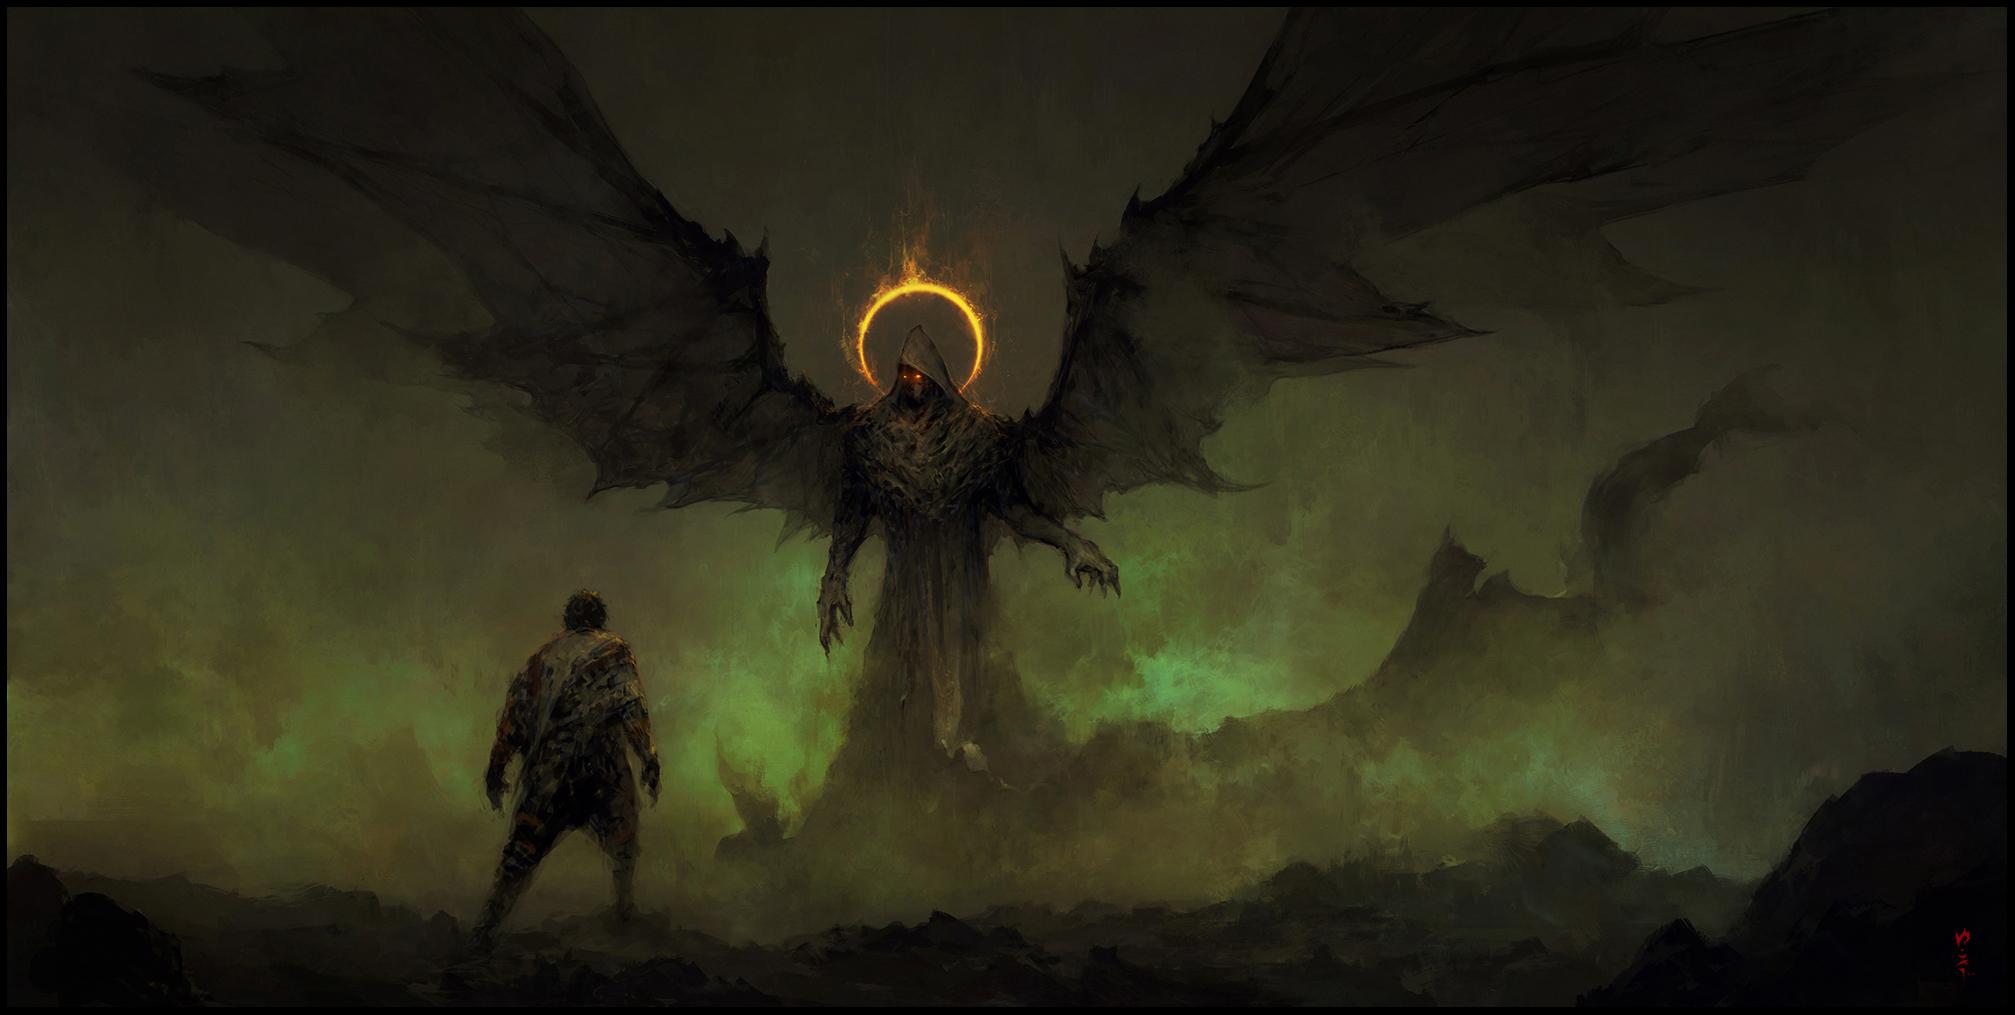 1202-false-angels-chris-cold